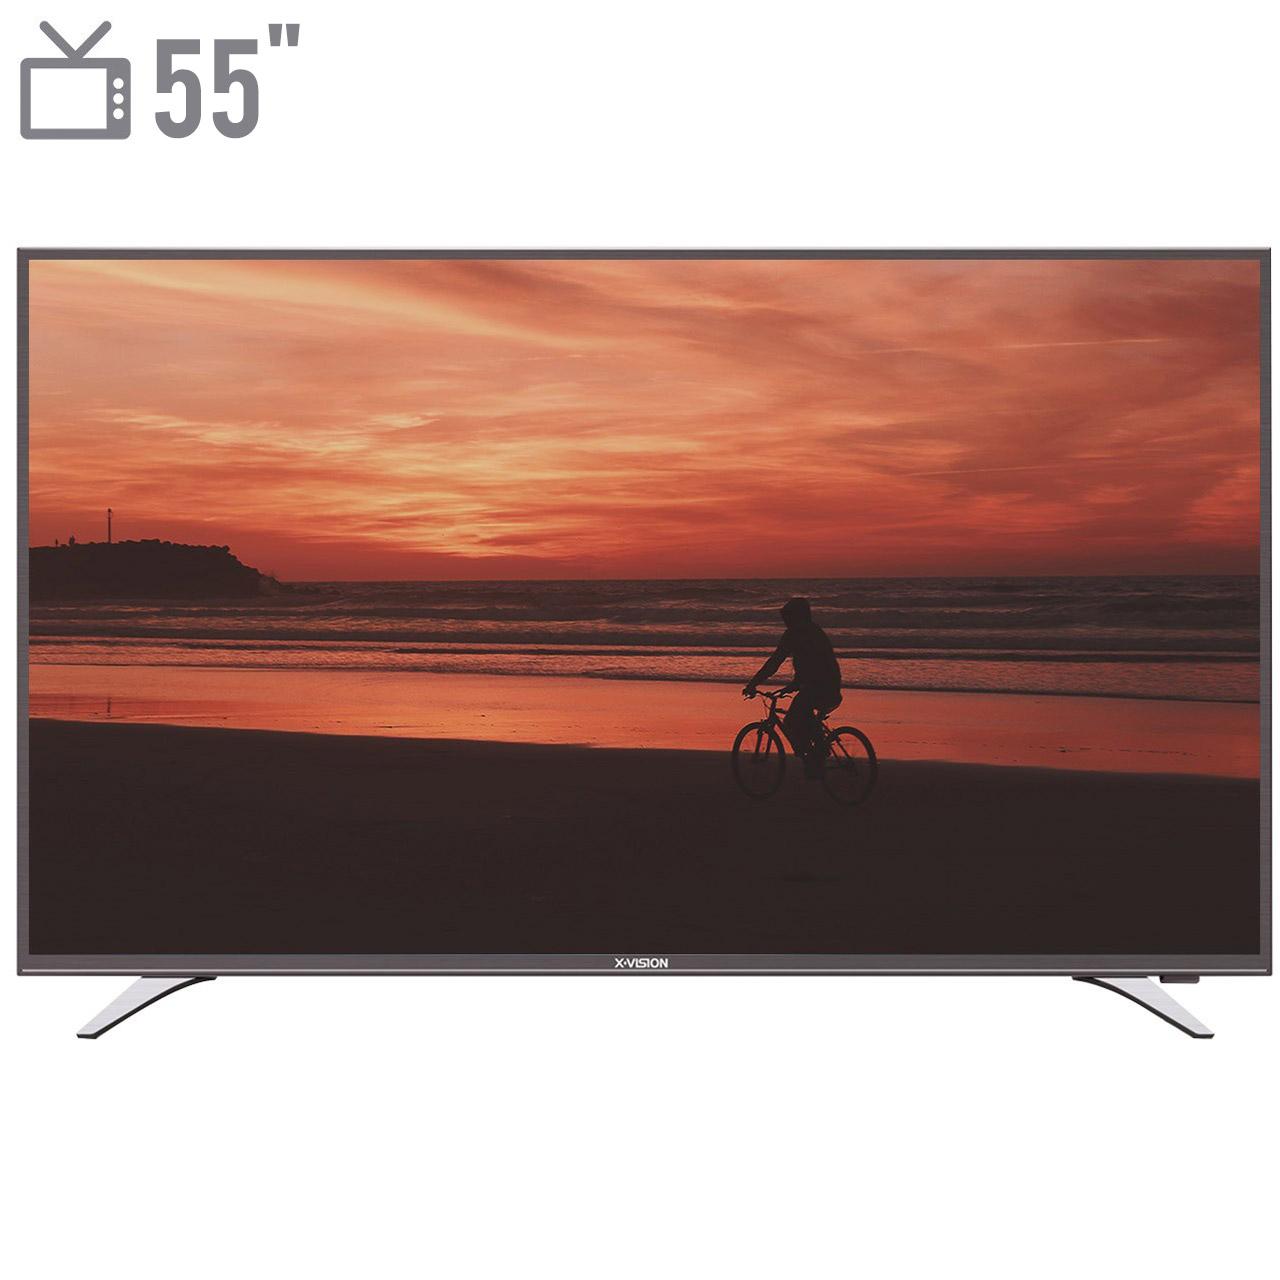 فروش اقساطی تلویزیون ال ای دی هوشمند ایکس ویژن مدل 55XT515 سایز 55 اینچ